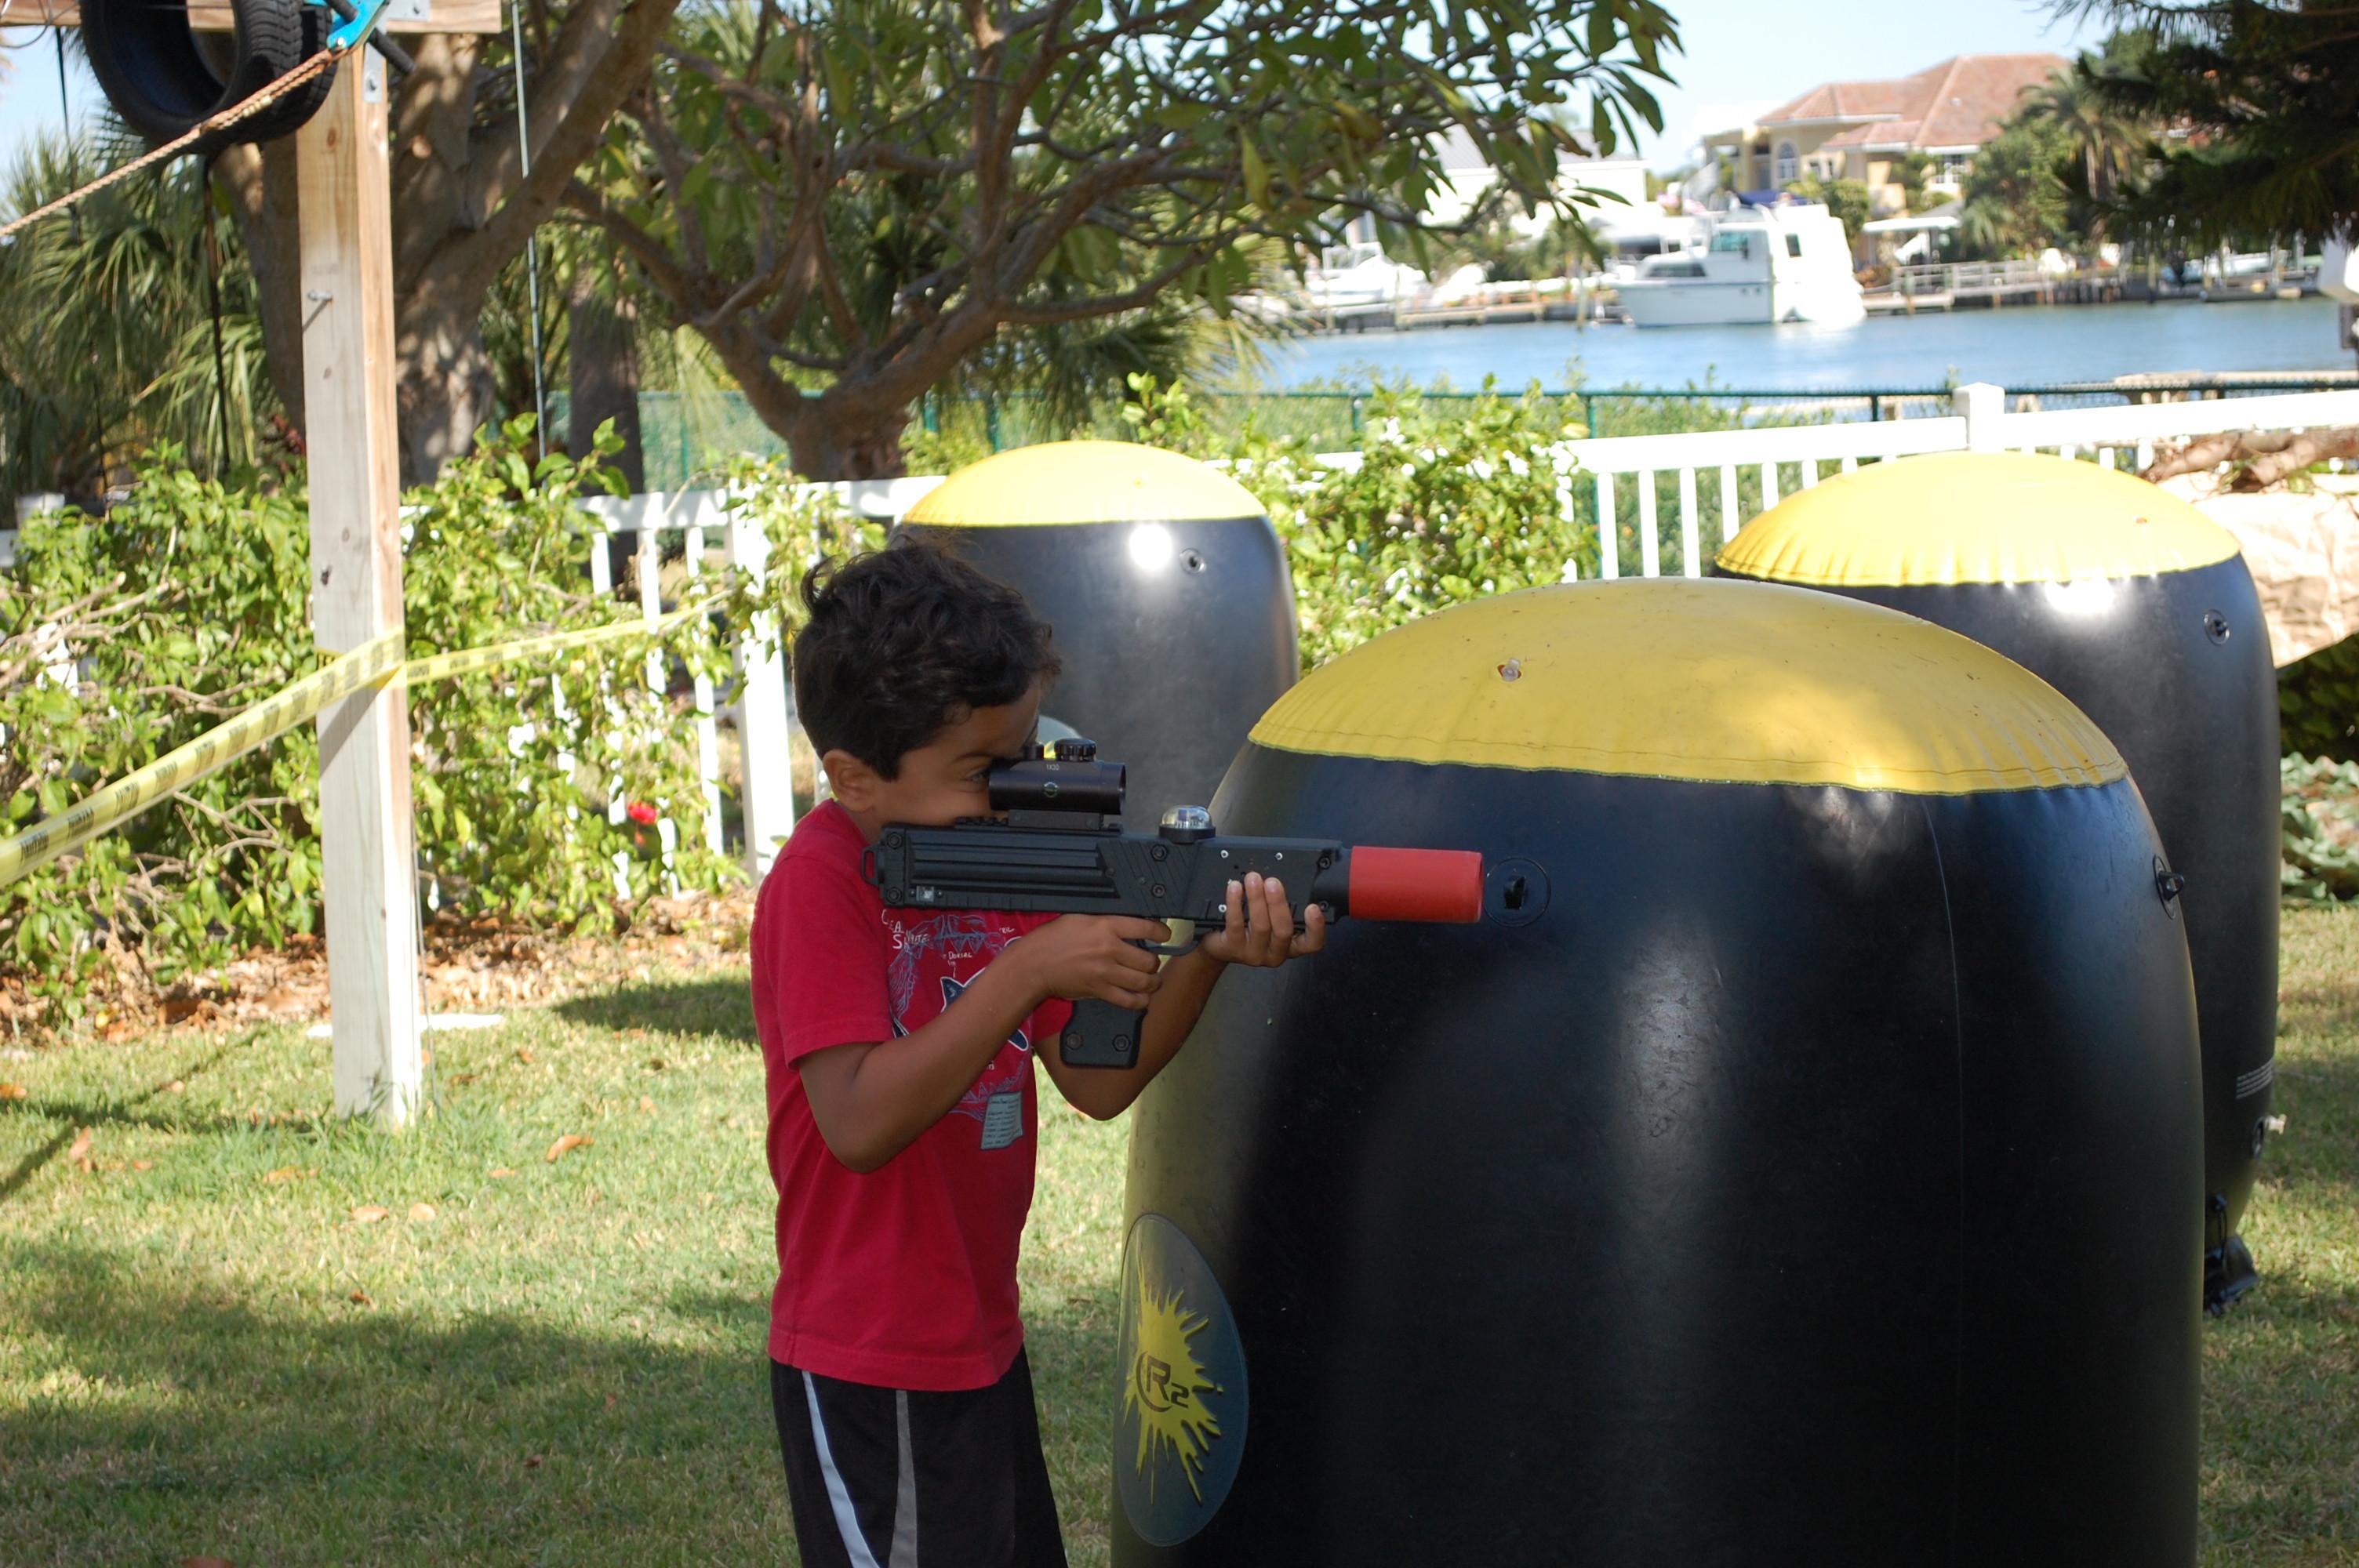 Laser Tag in Punta Gorda,FL